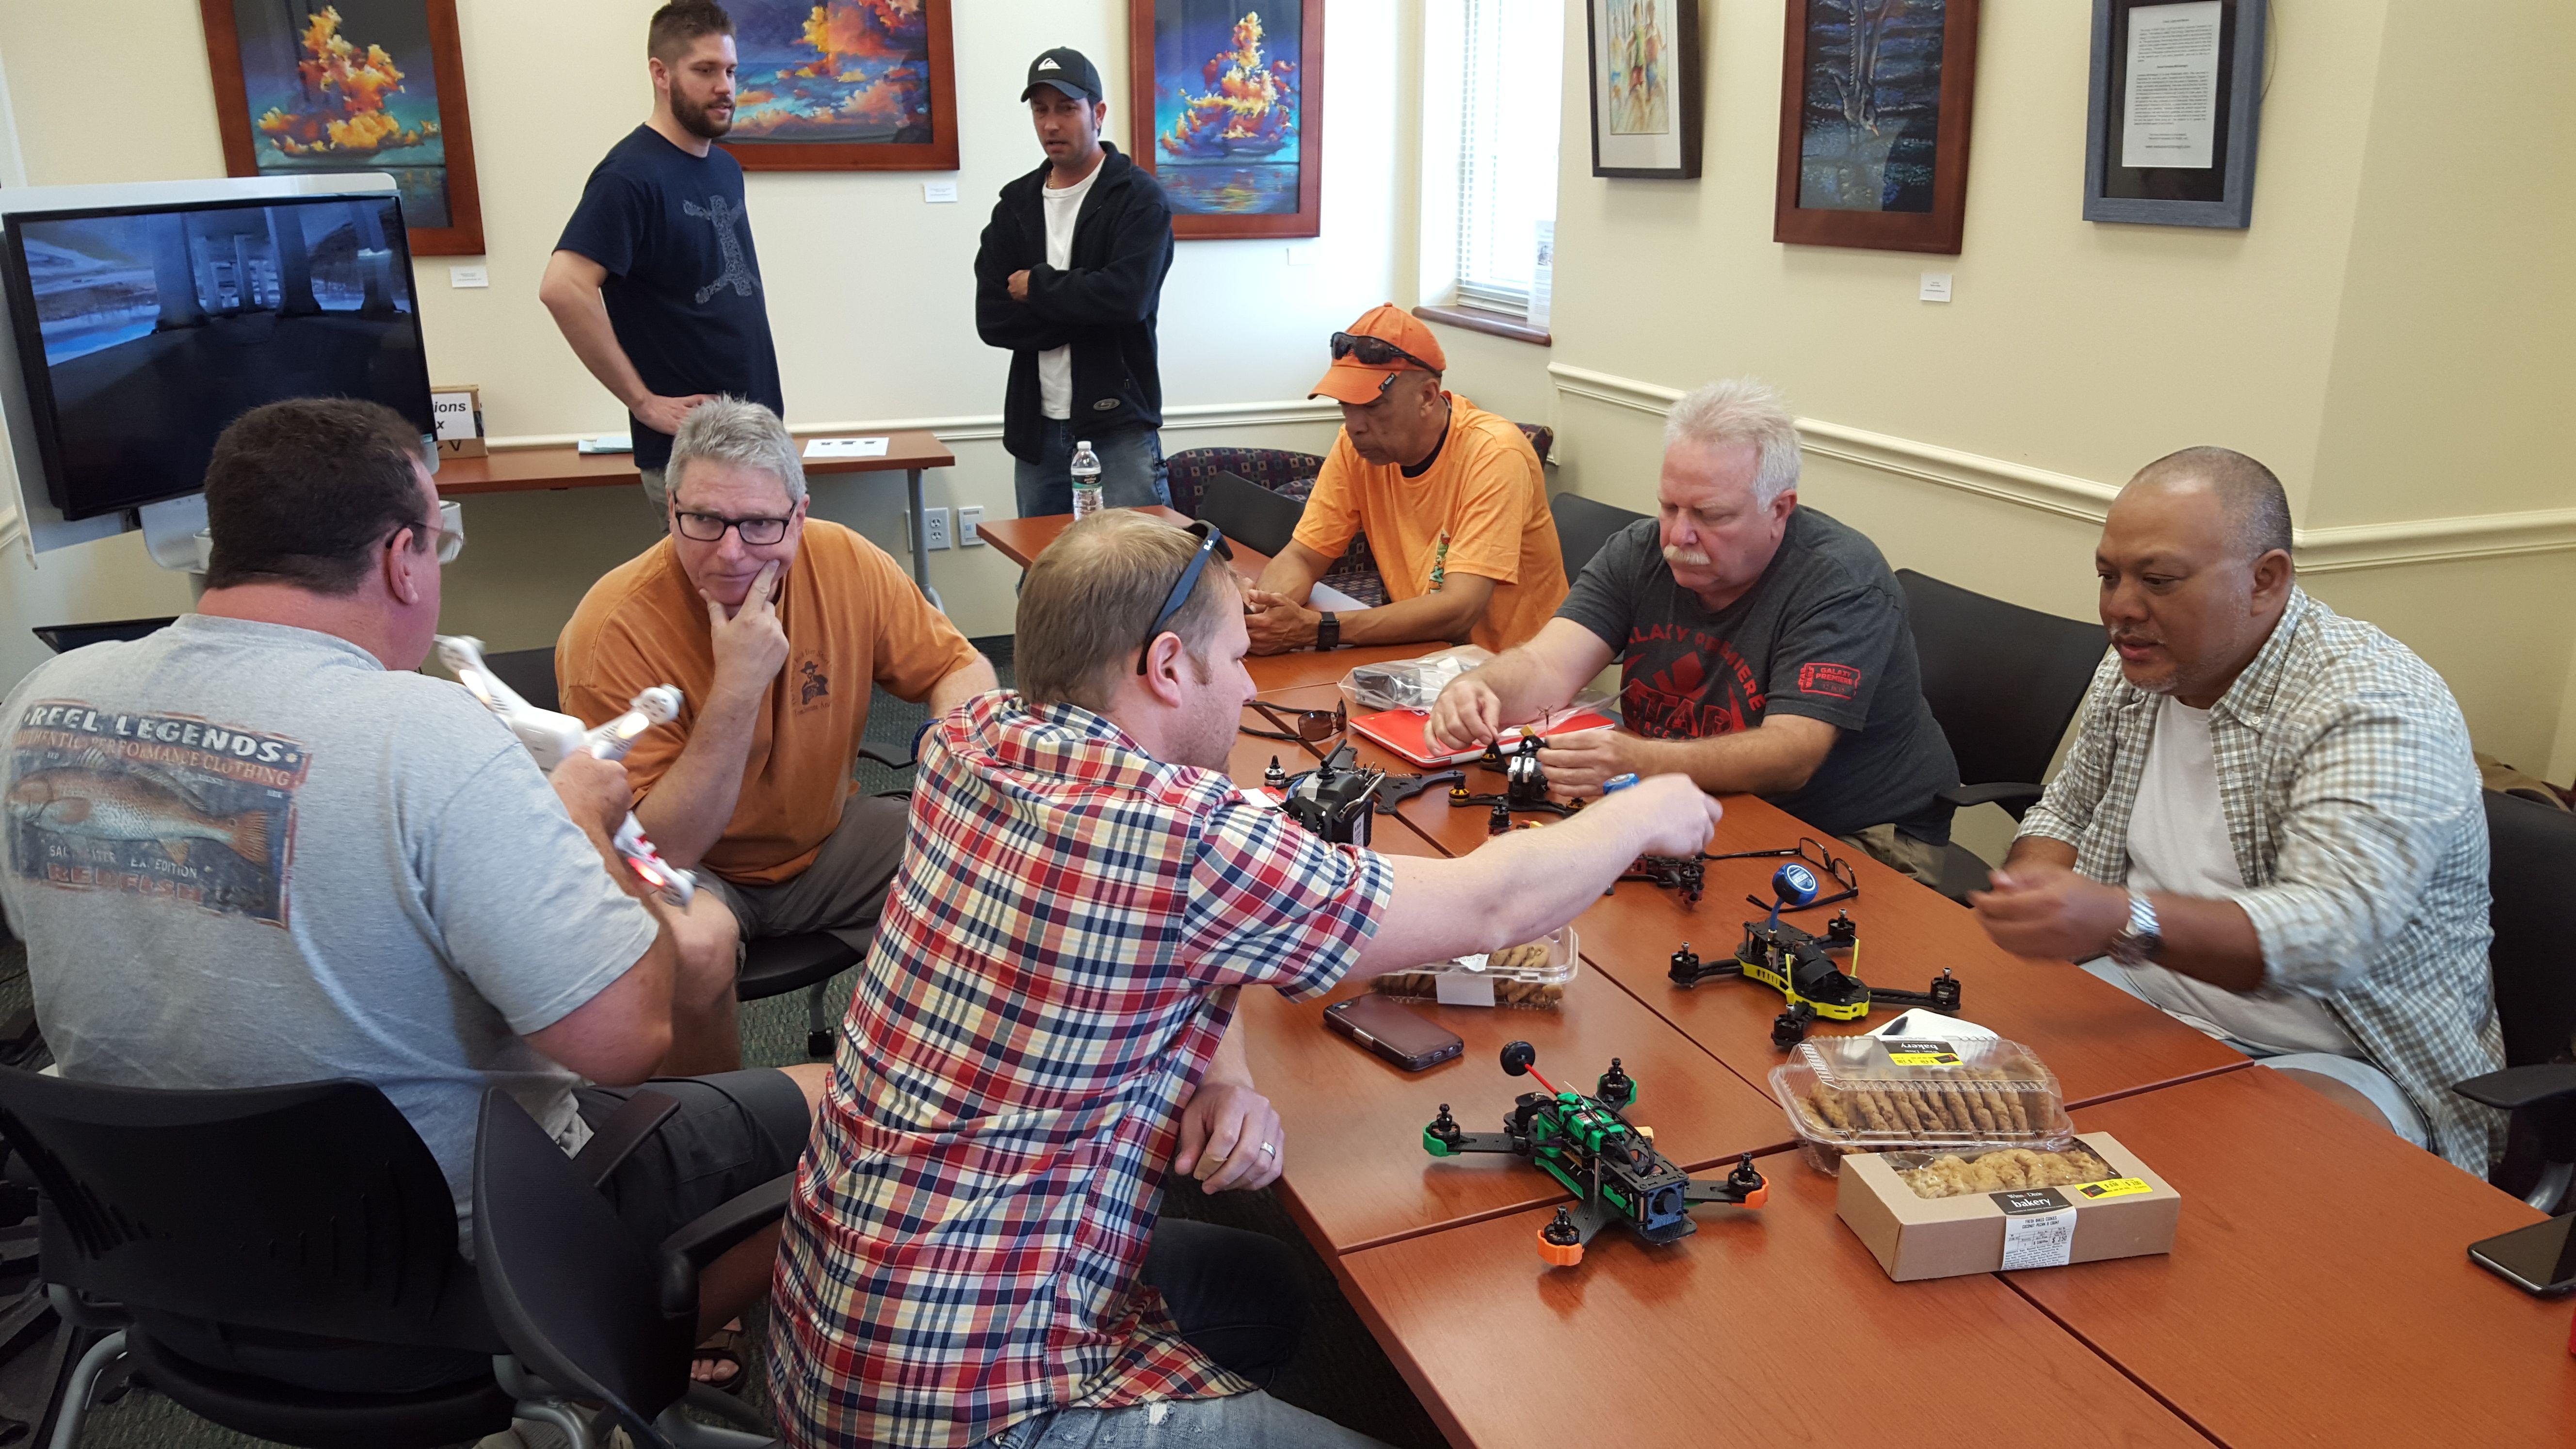 Tampa Drones Meetup